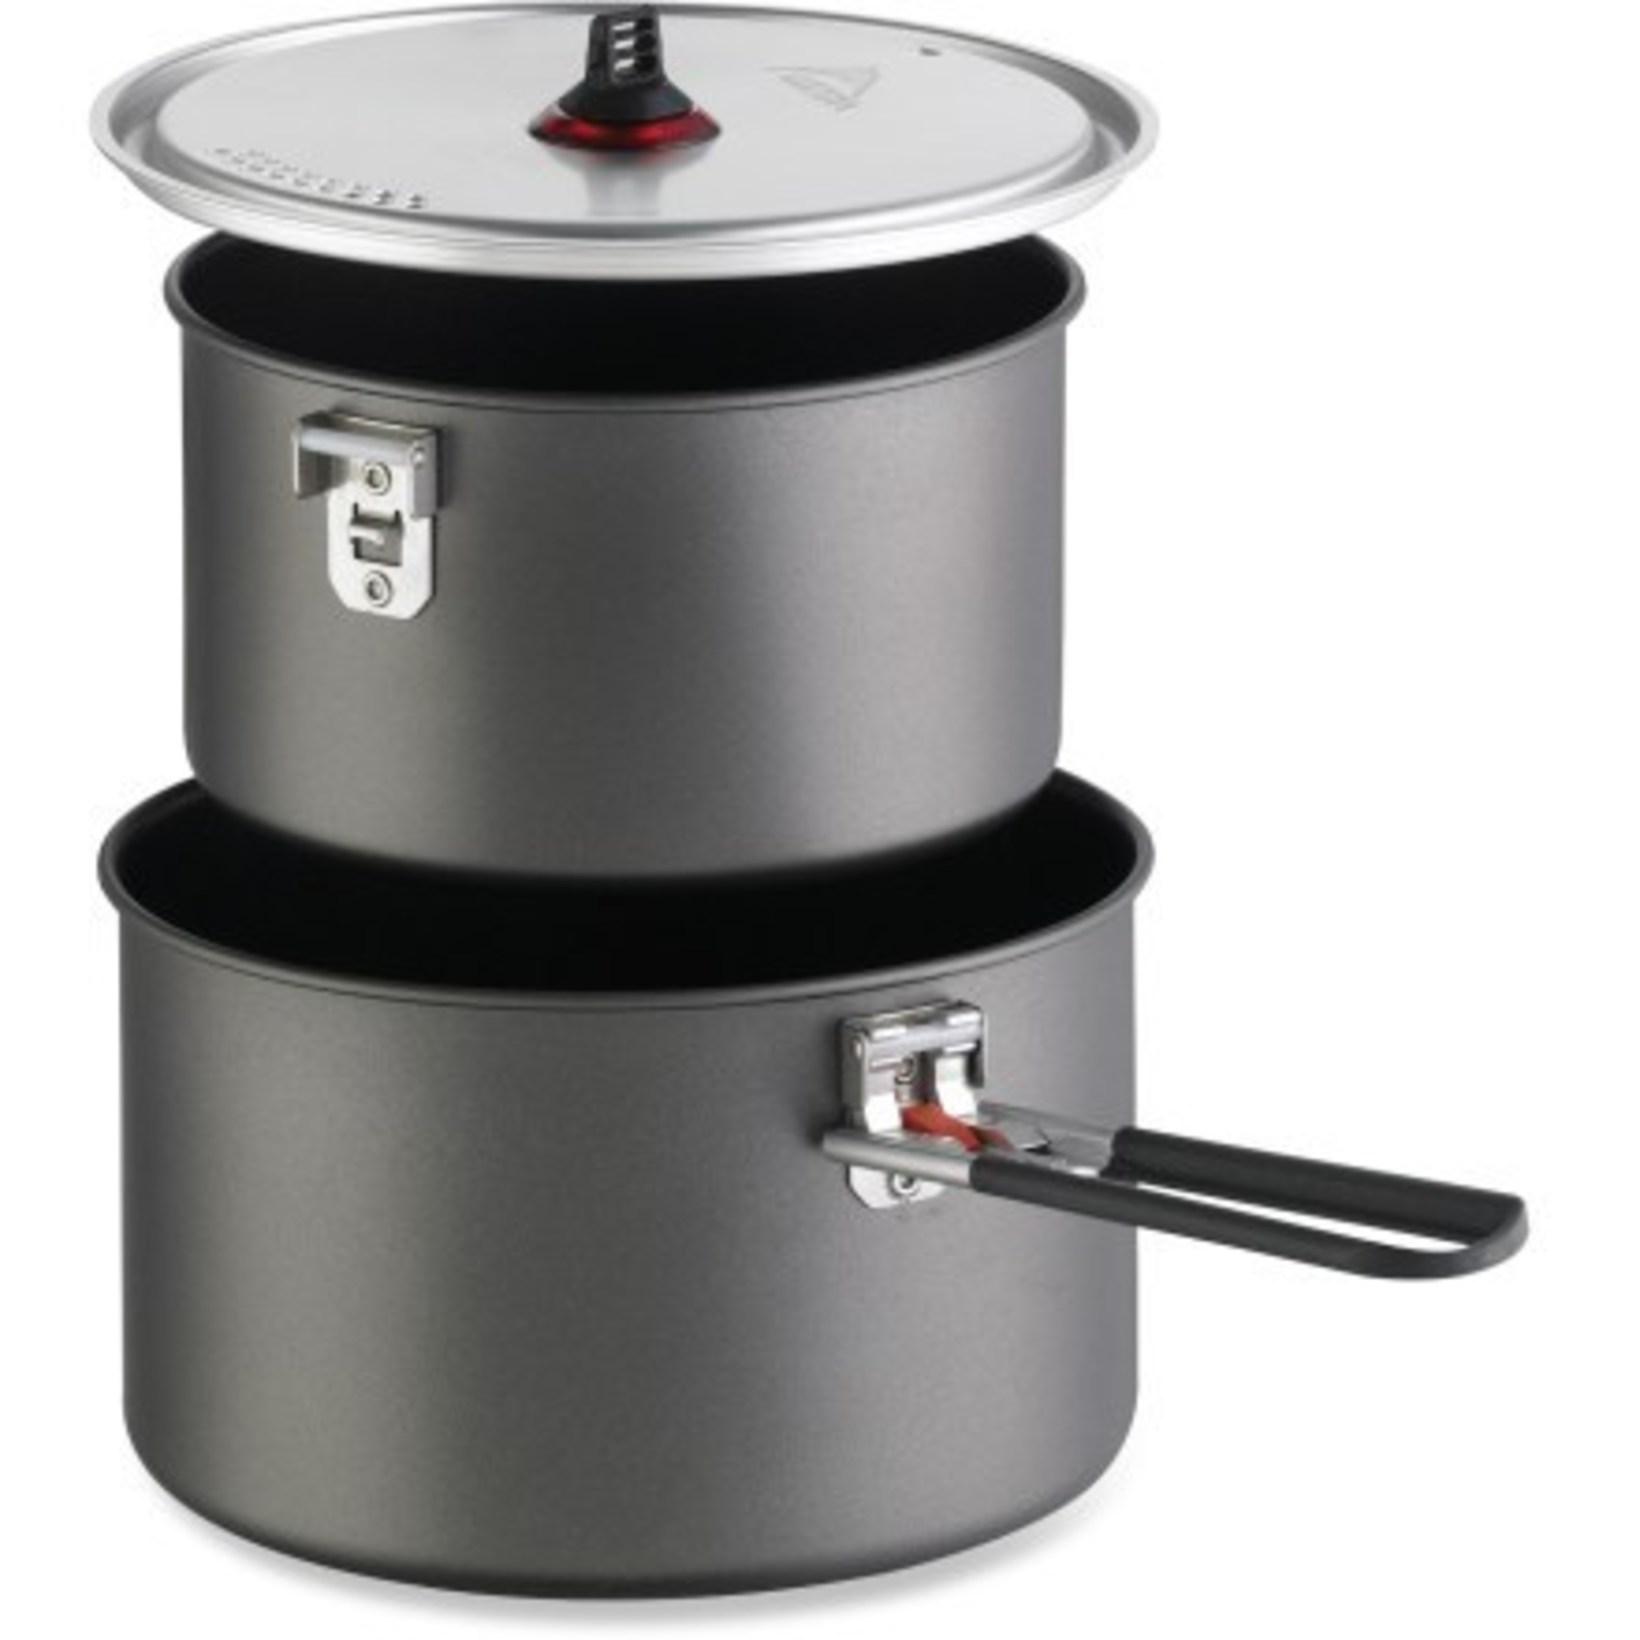 Medium Pot Set